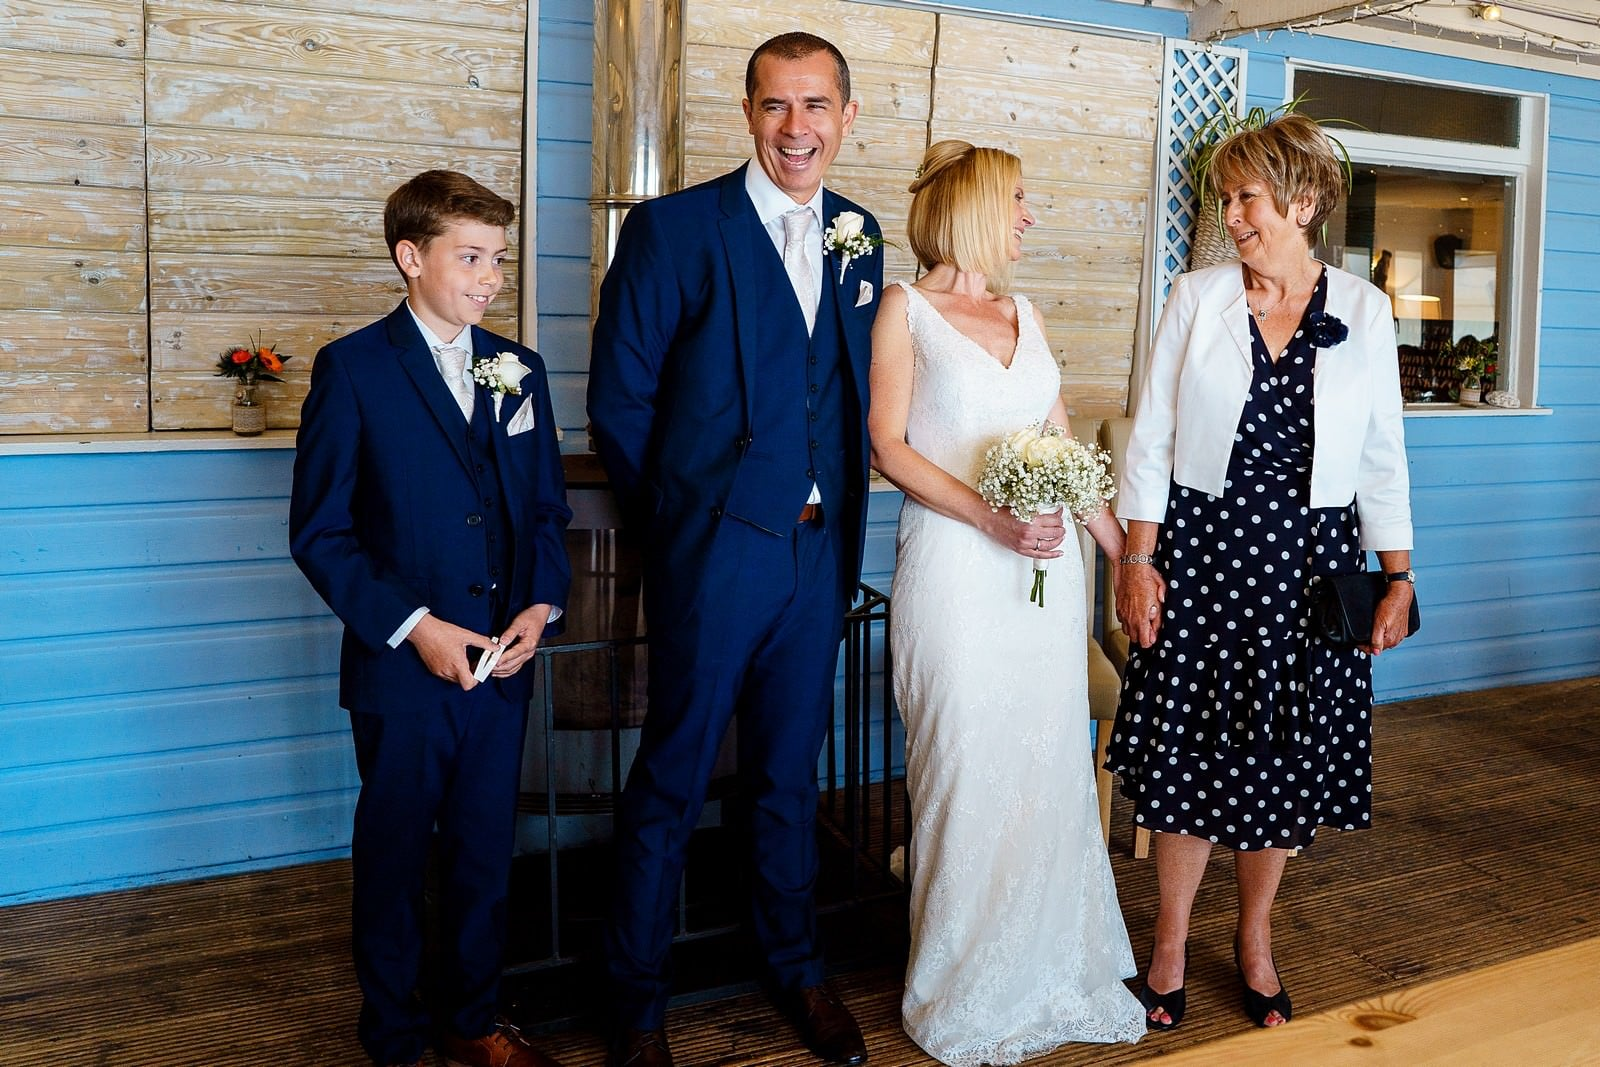 indoor wedding ceremony at lusty glaze